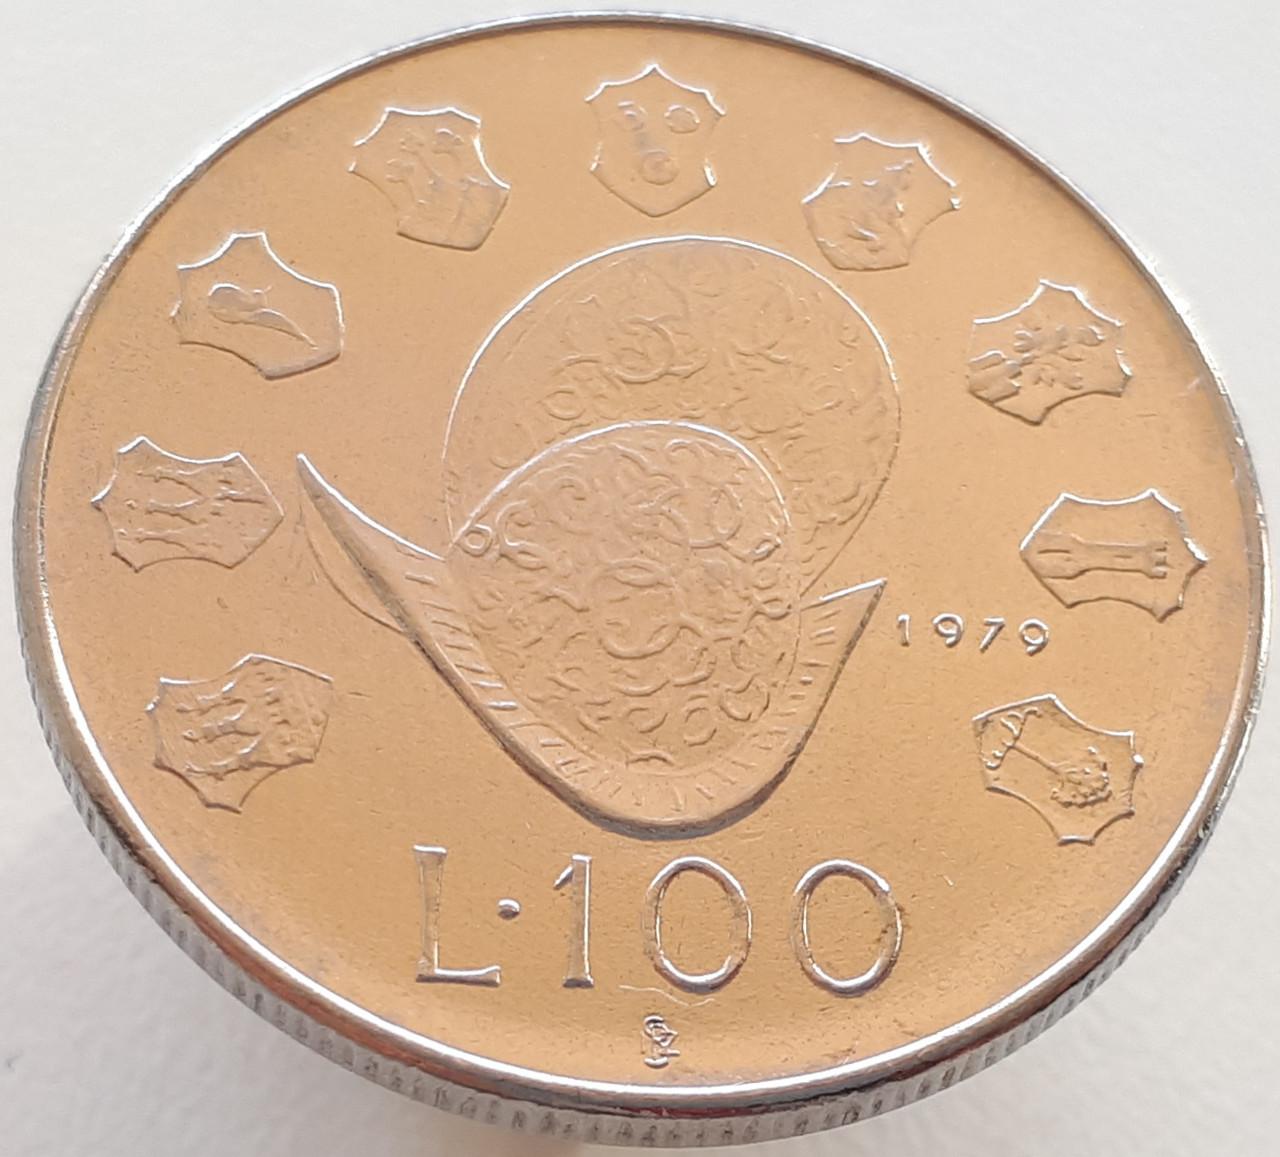 Сан-Марино 100 лир 1979